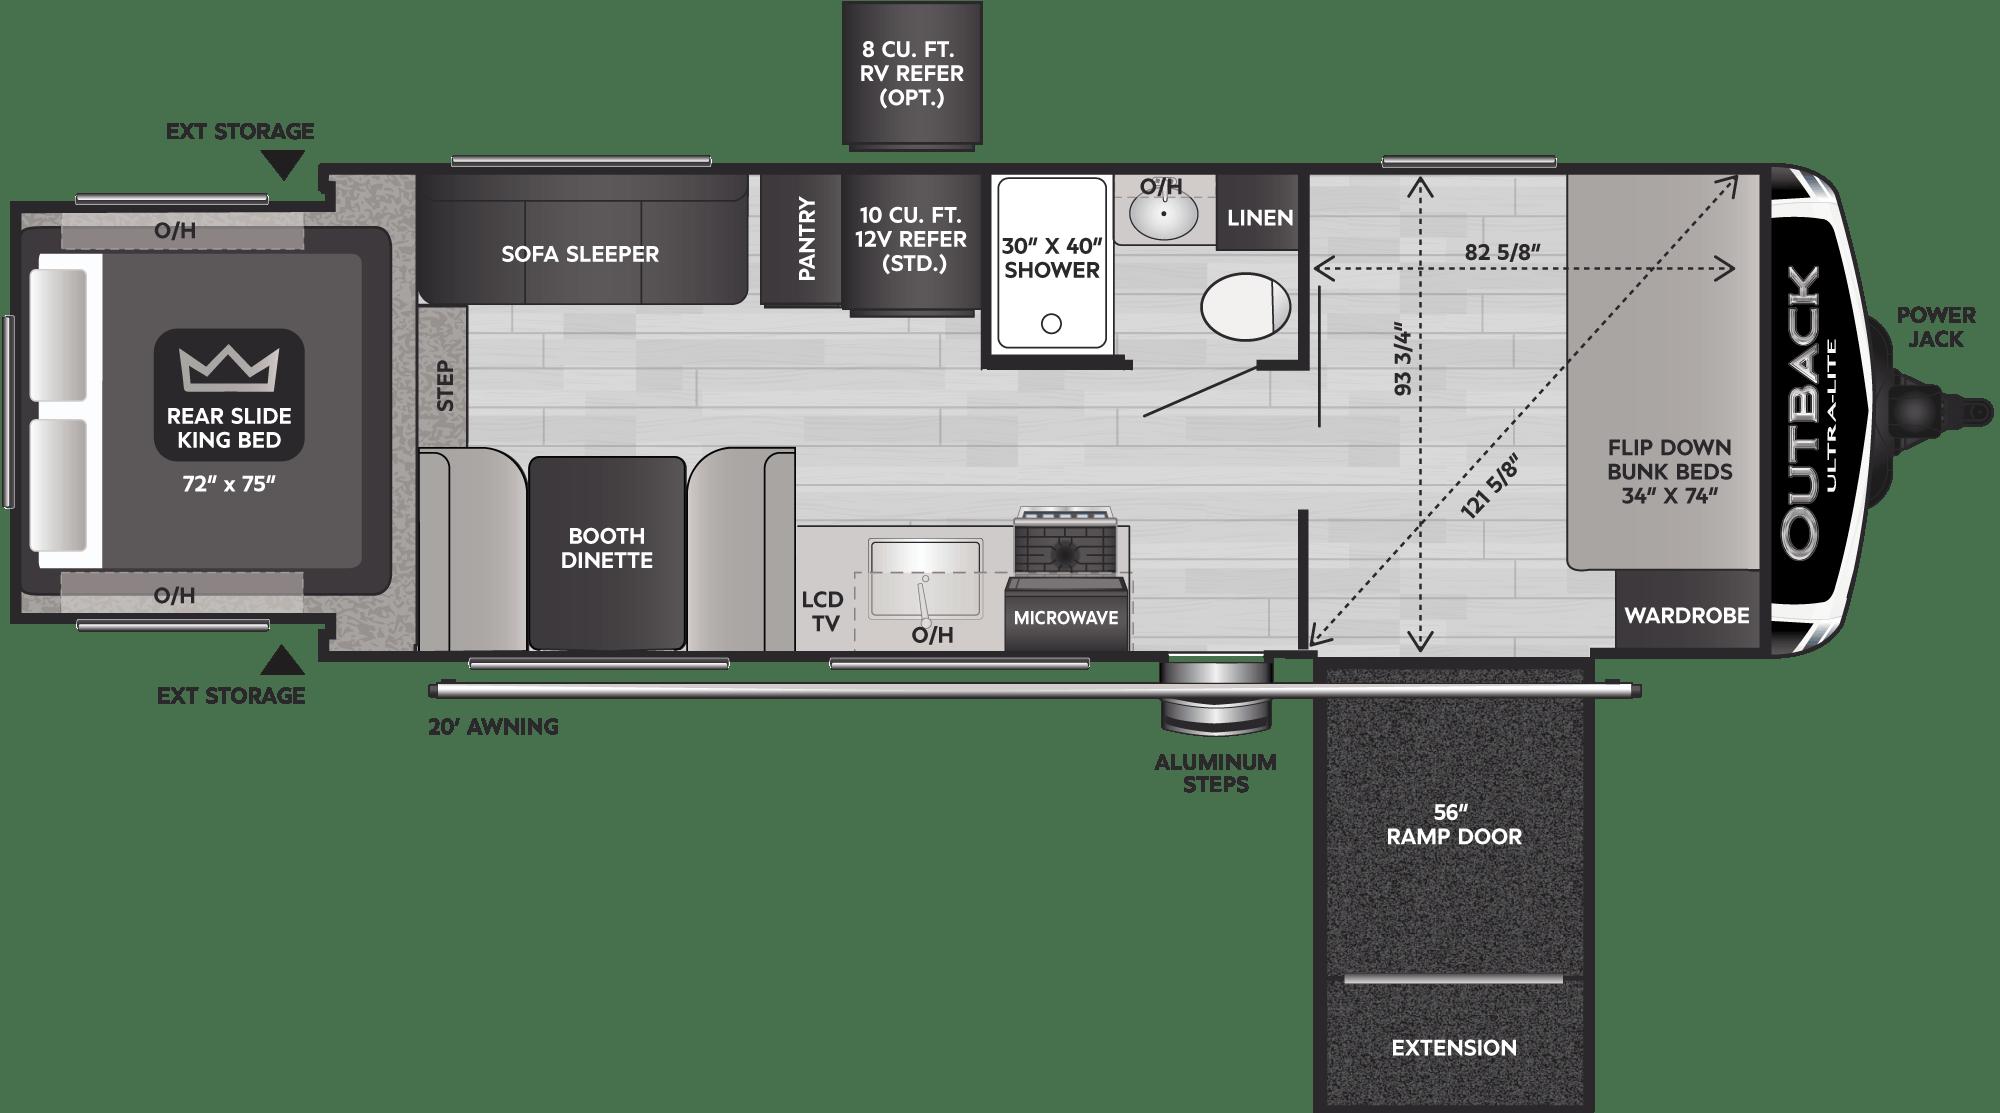 Floorplan of RV model 240URS